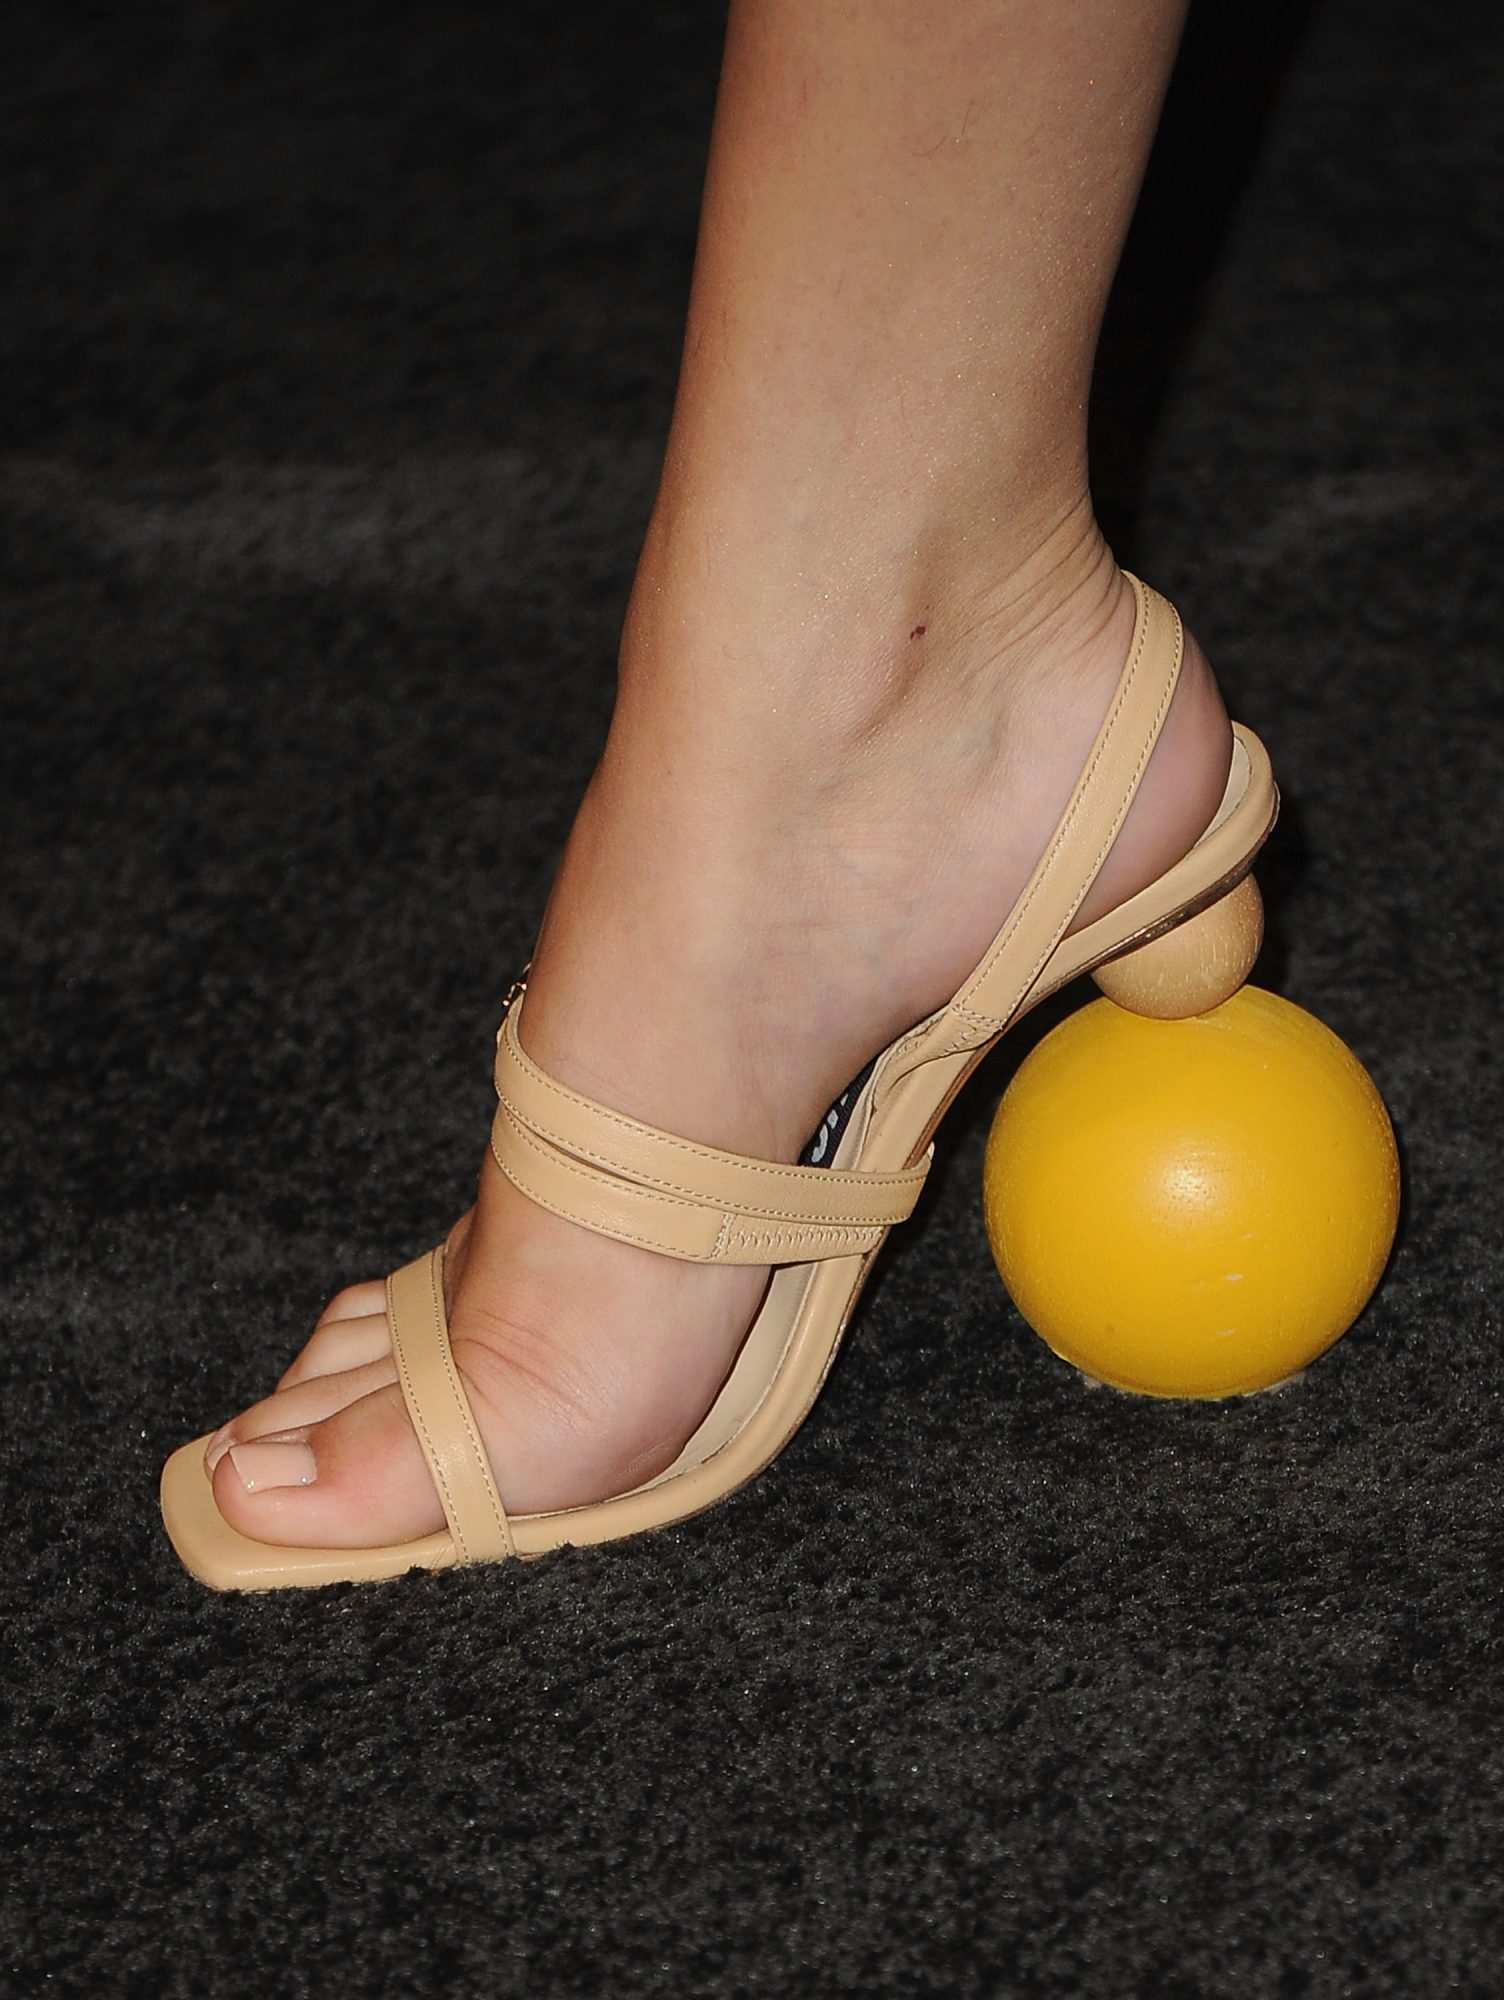 Selena Gomez, zapatos, sandalias, looks, desparejado, diferentes, tacones